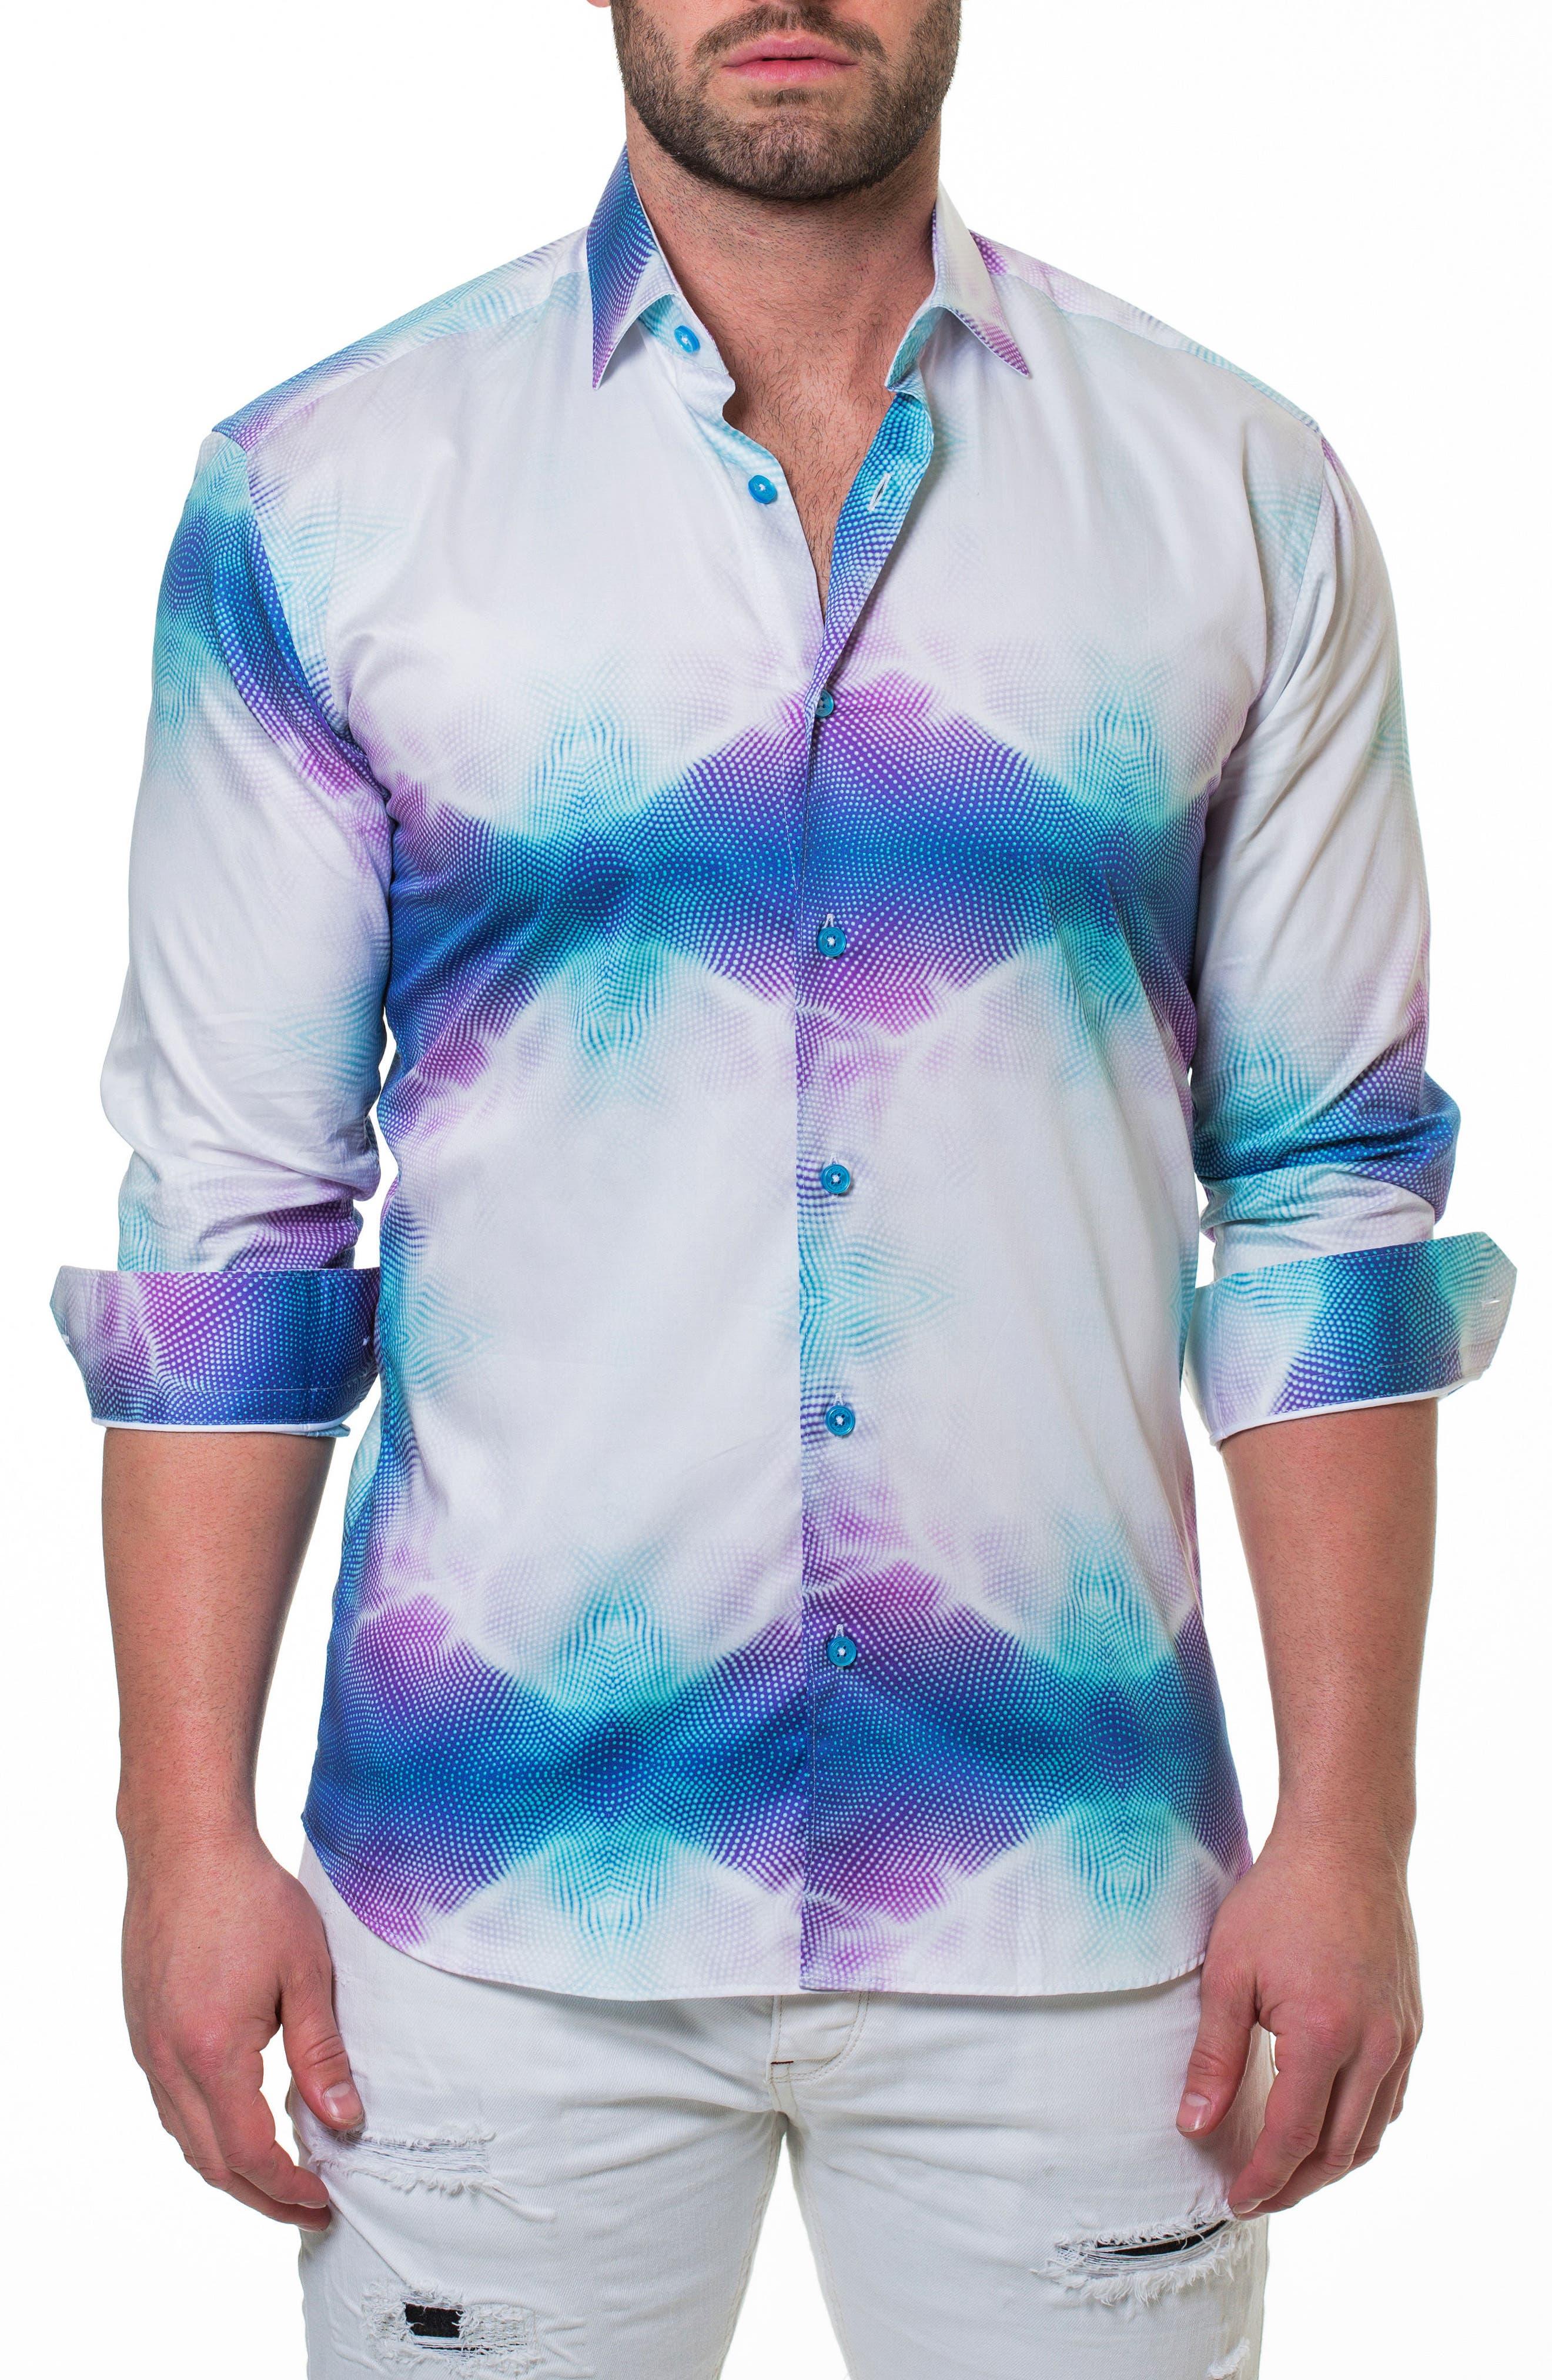 Luxor Invent Slim Fit Sport Shirt,                         Main,                         color, 110